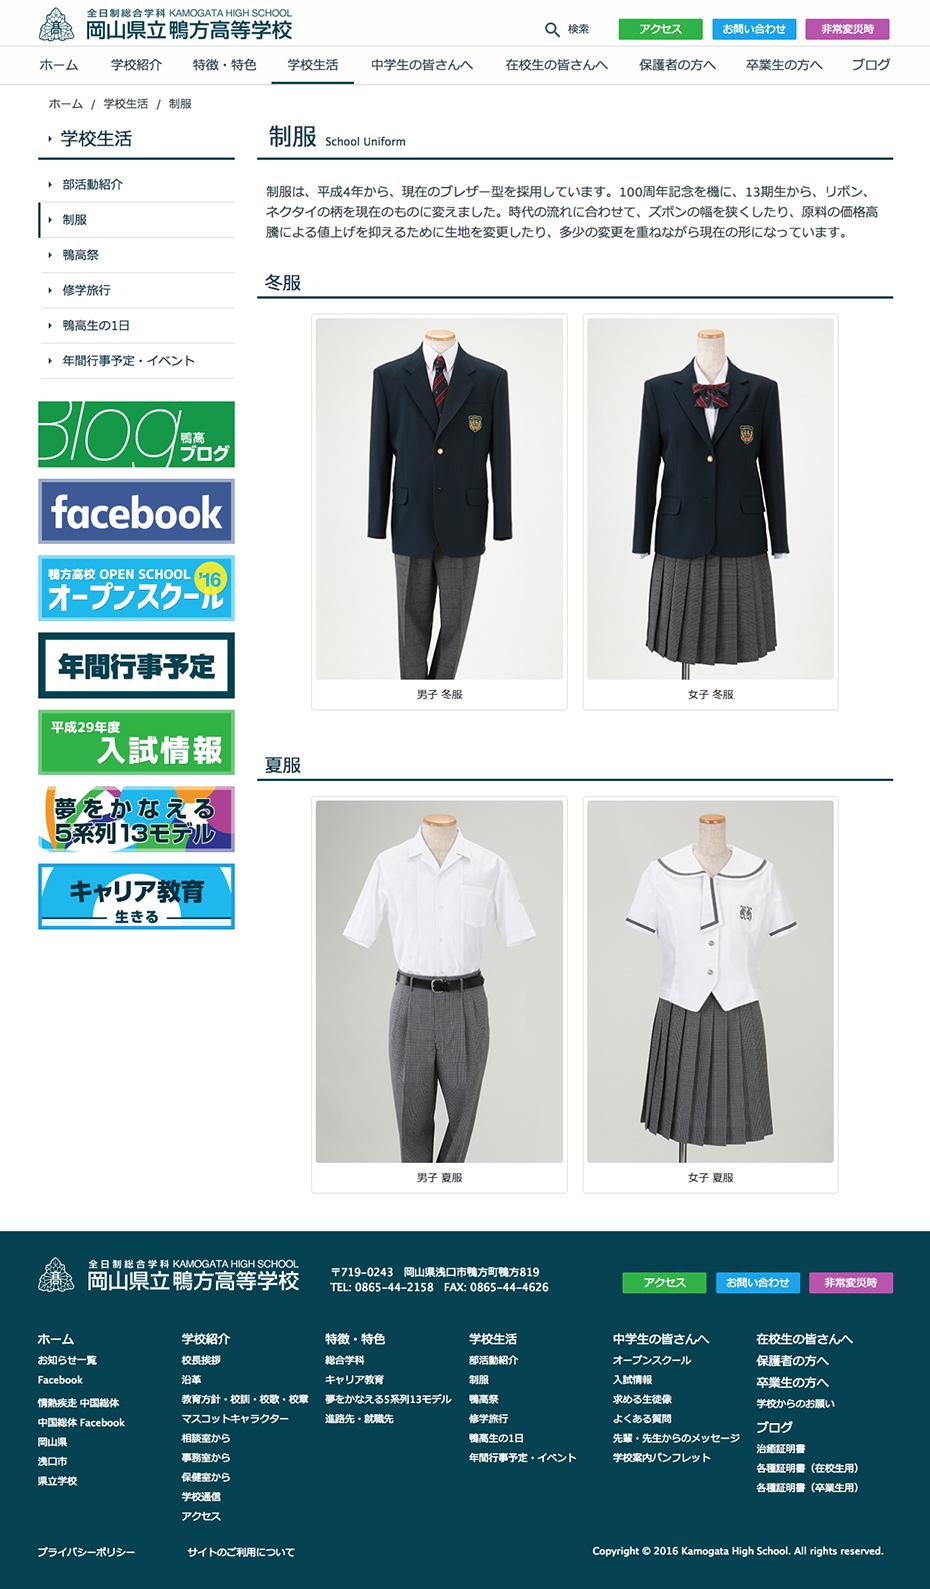 岡山県立鴨方高等学校様 ホームページ 制服